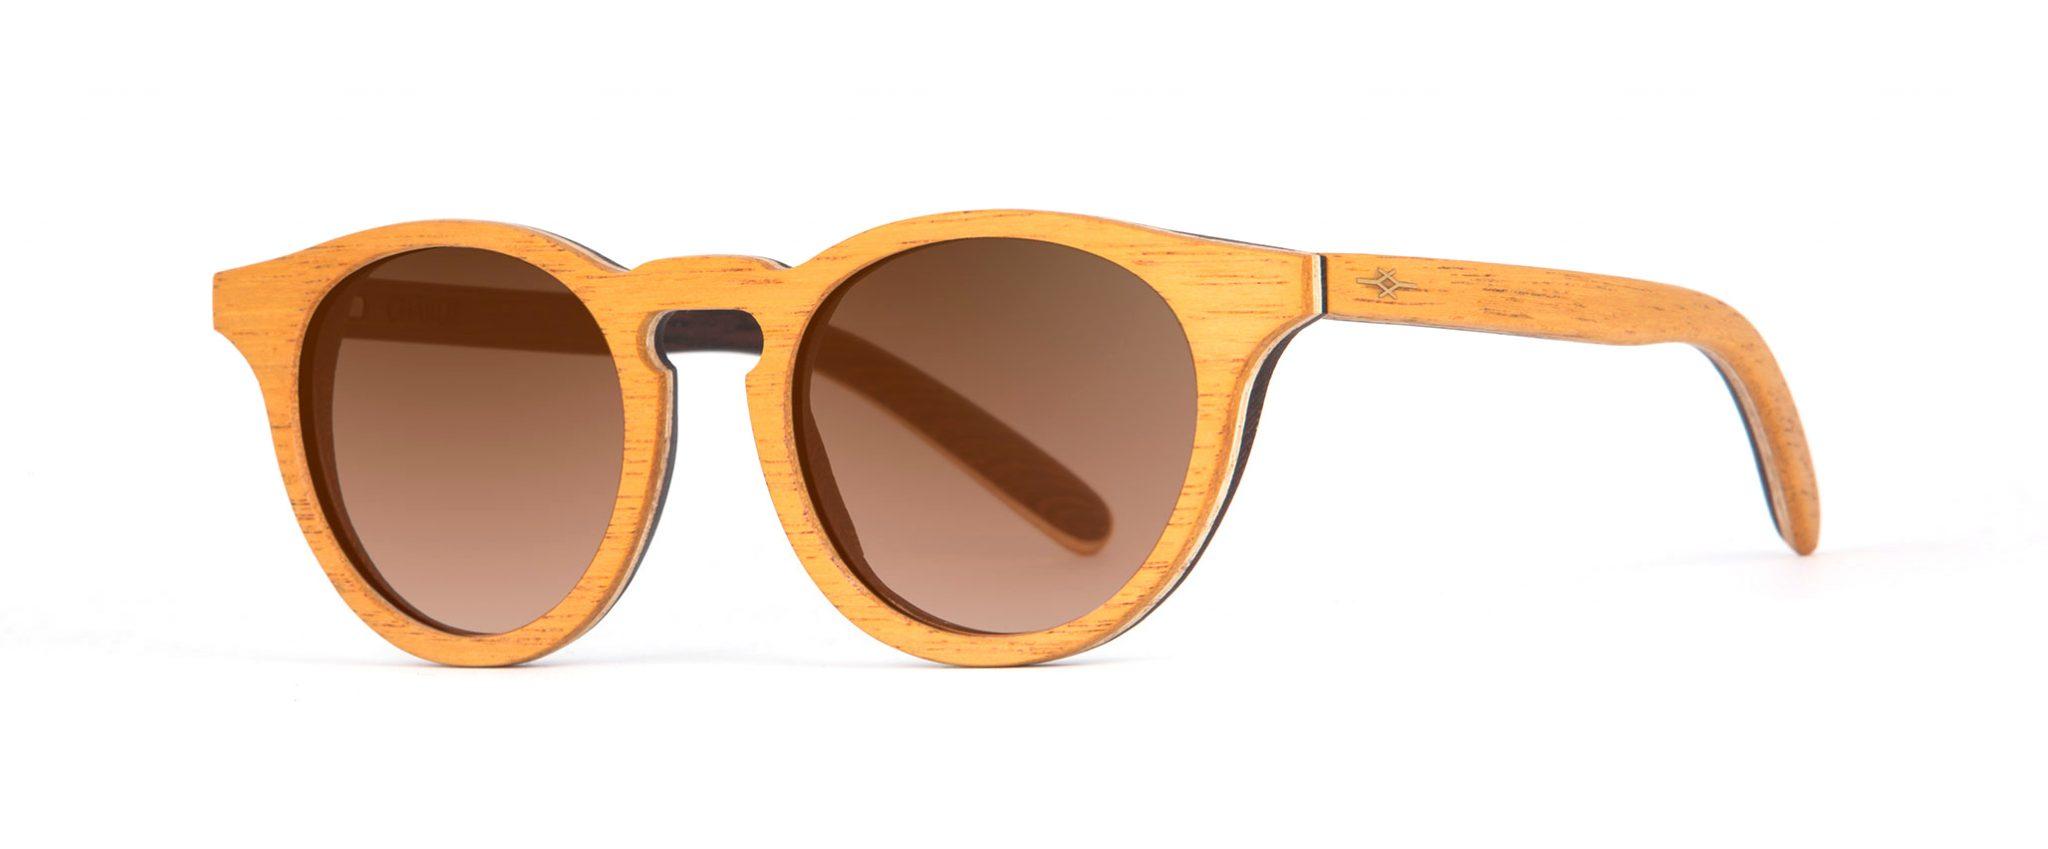 https://vakayeyewear.com/wp-content/uploads/2017/03/charlie-side-badi-sunglasses-designer-eyewear.jpg